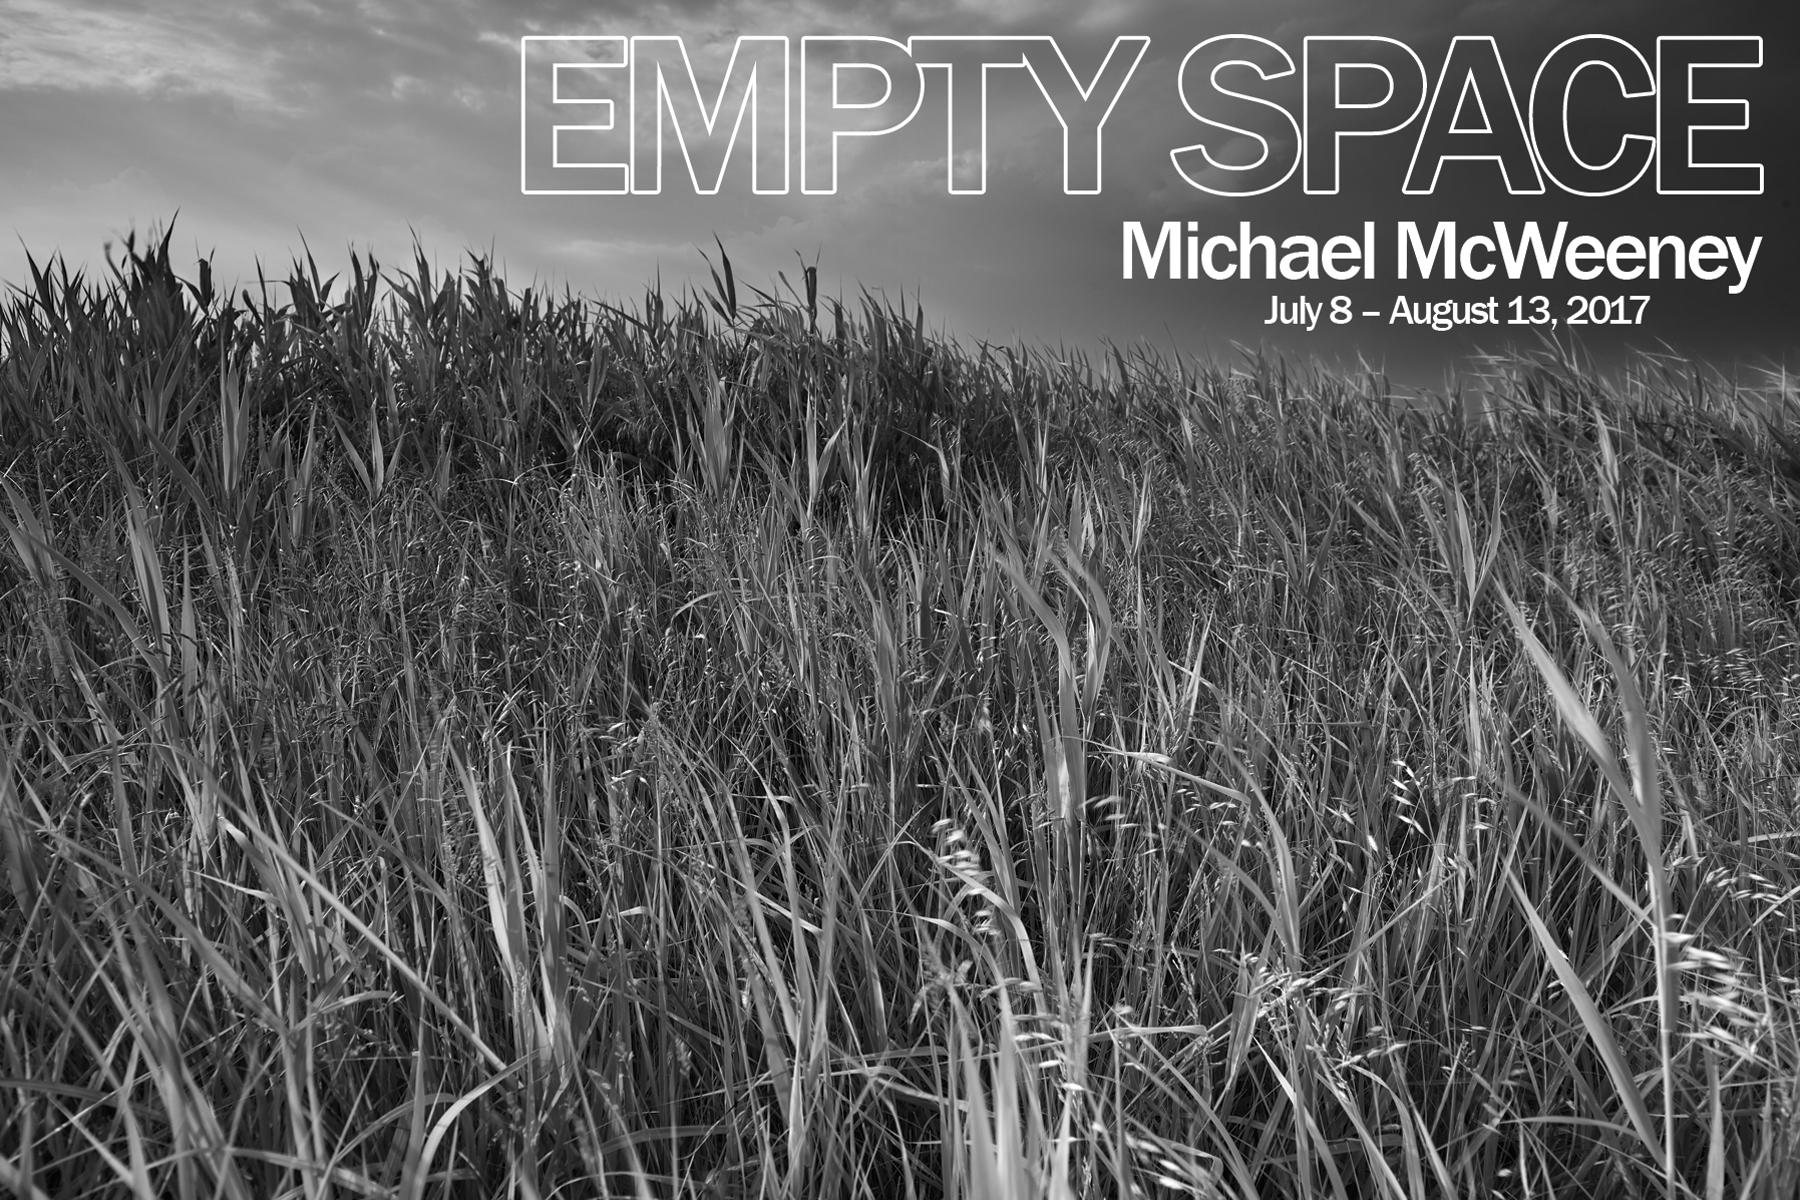 Photographer Michael McWeeney